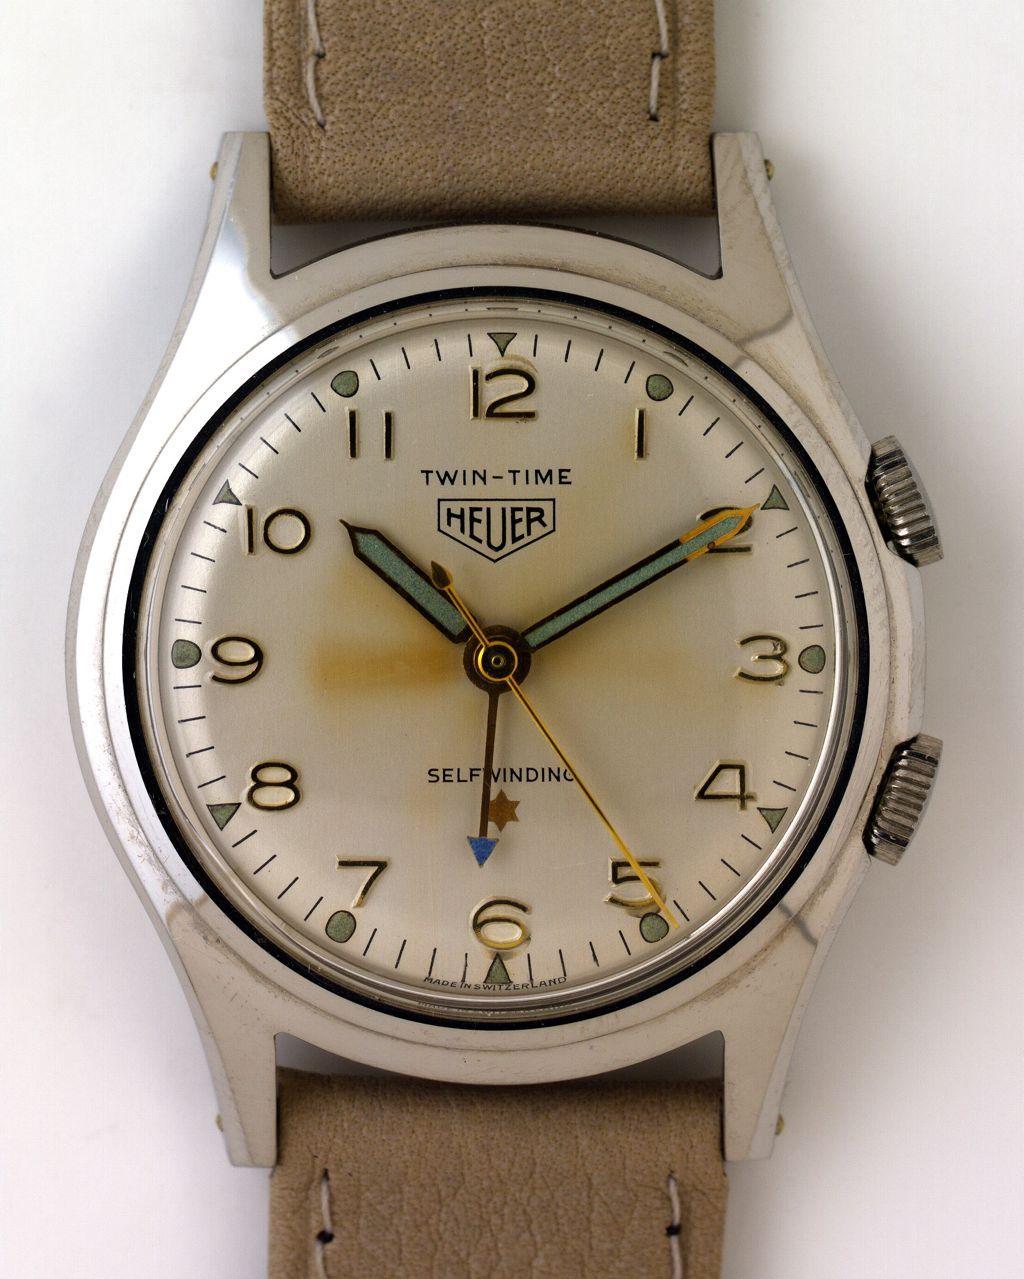 miglior servizio b2746 f67e1 Heuer Twin Time. Nice watch. | vintage watch in 2019 ...